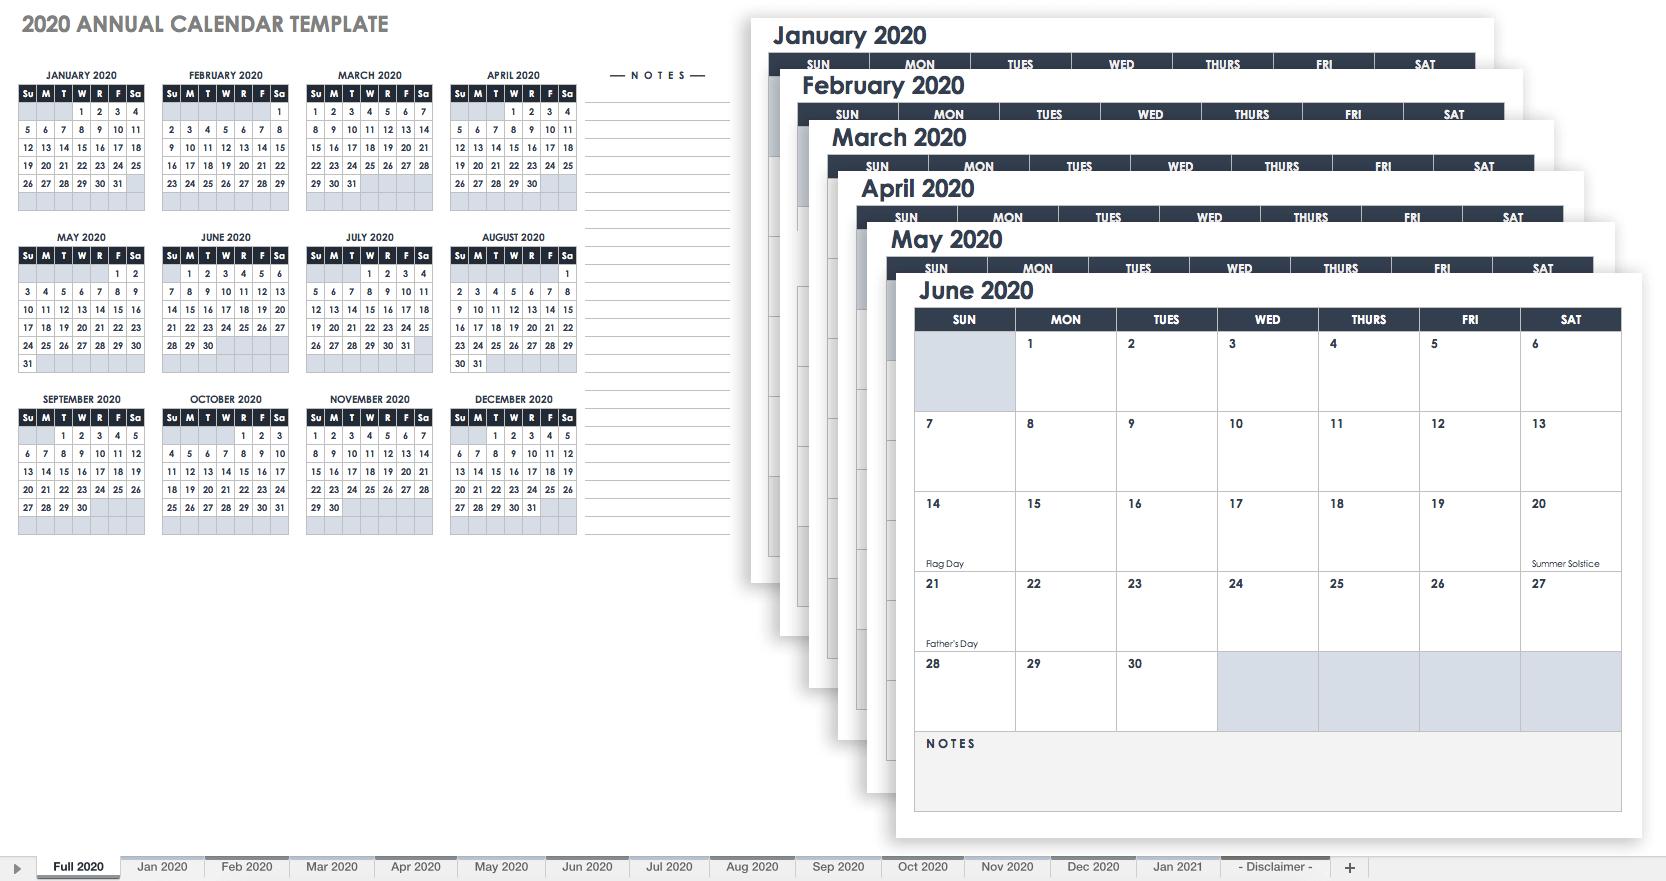 Free, Printable Excel Calendar Templates For 2019 & On | Smartsheet regarding Annual Calendar Template Excel